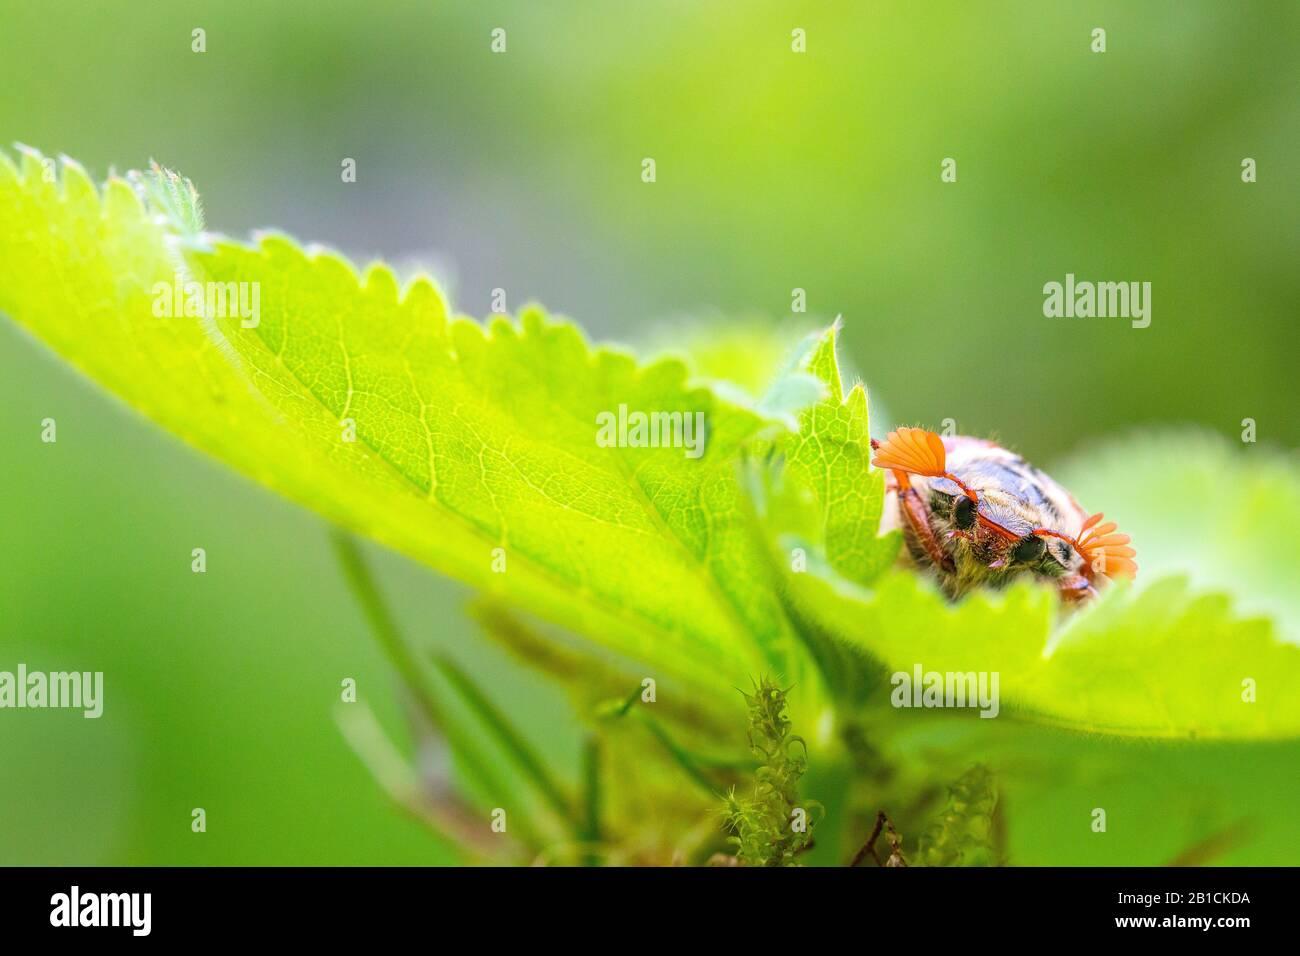 Common cockchafer, Maybug, Maybeetle (Melolontha melolontha), sitting on a leaf, Netherlands, Frisia, Delleboersterheide Stock Photo